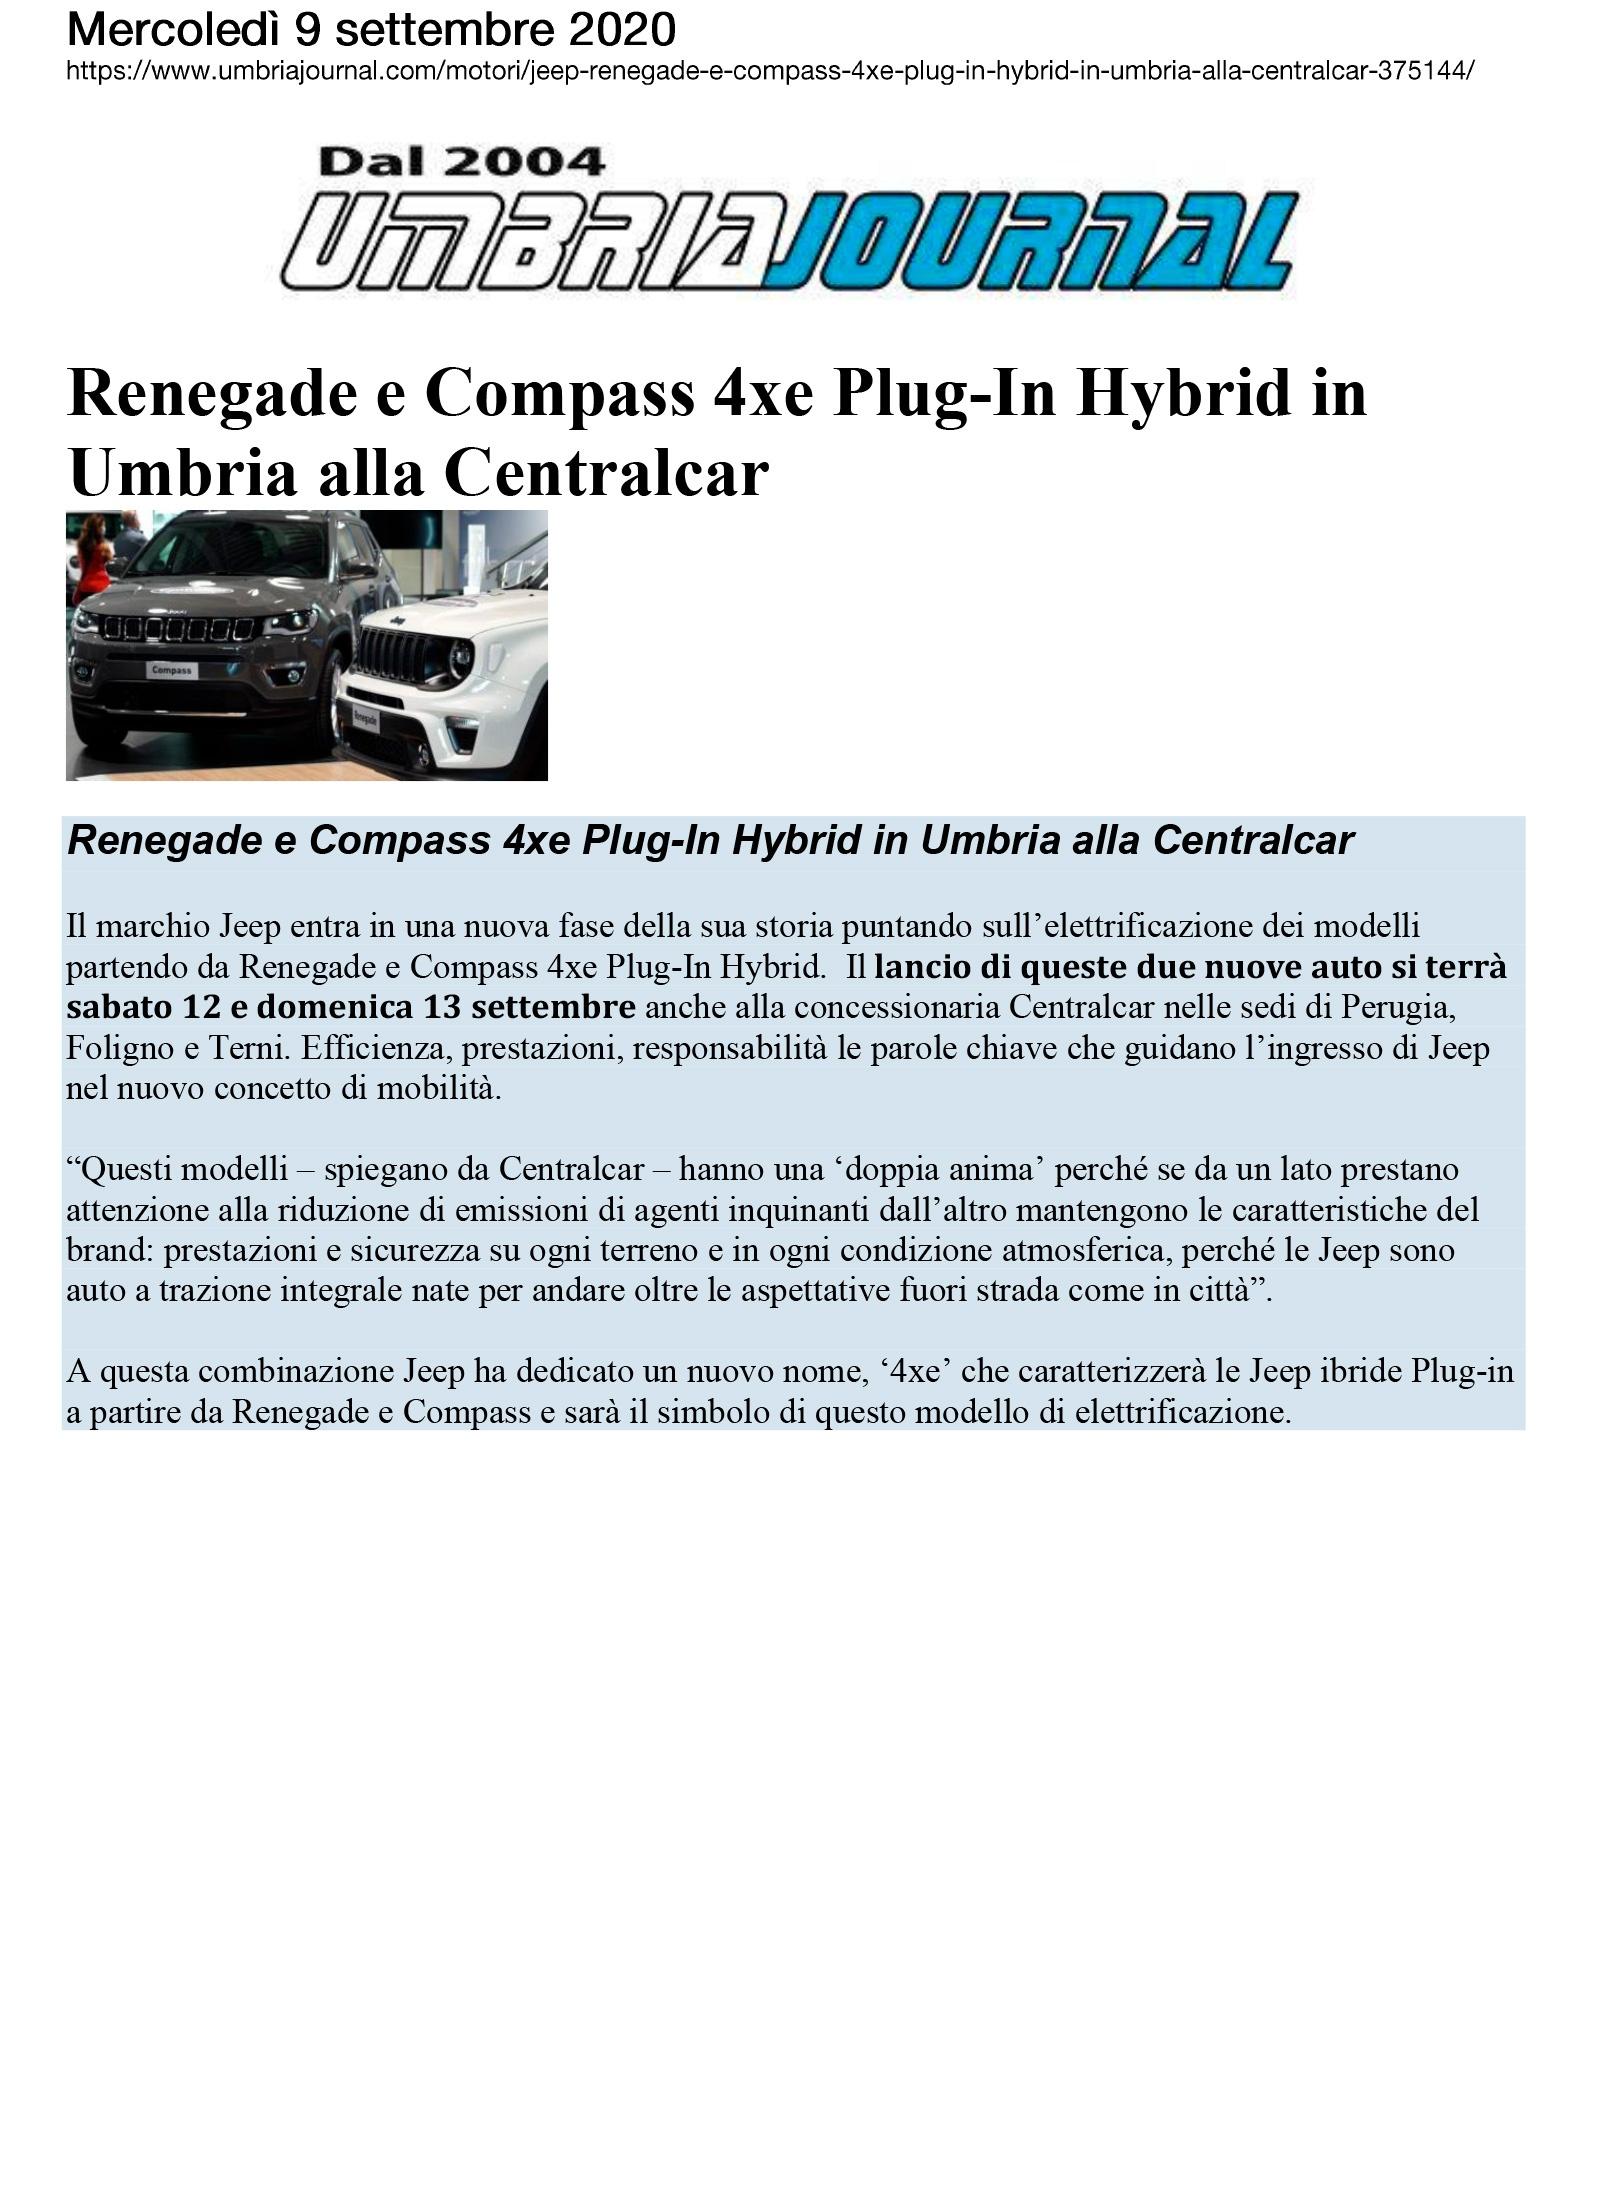 Renegade e Compass 4xe Plug-in Hybrid in Umbria alla Centralcar